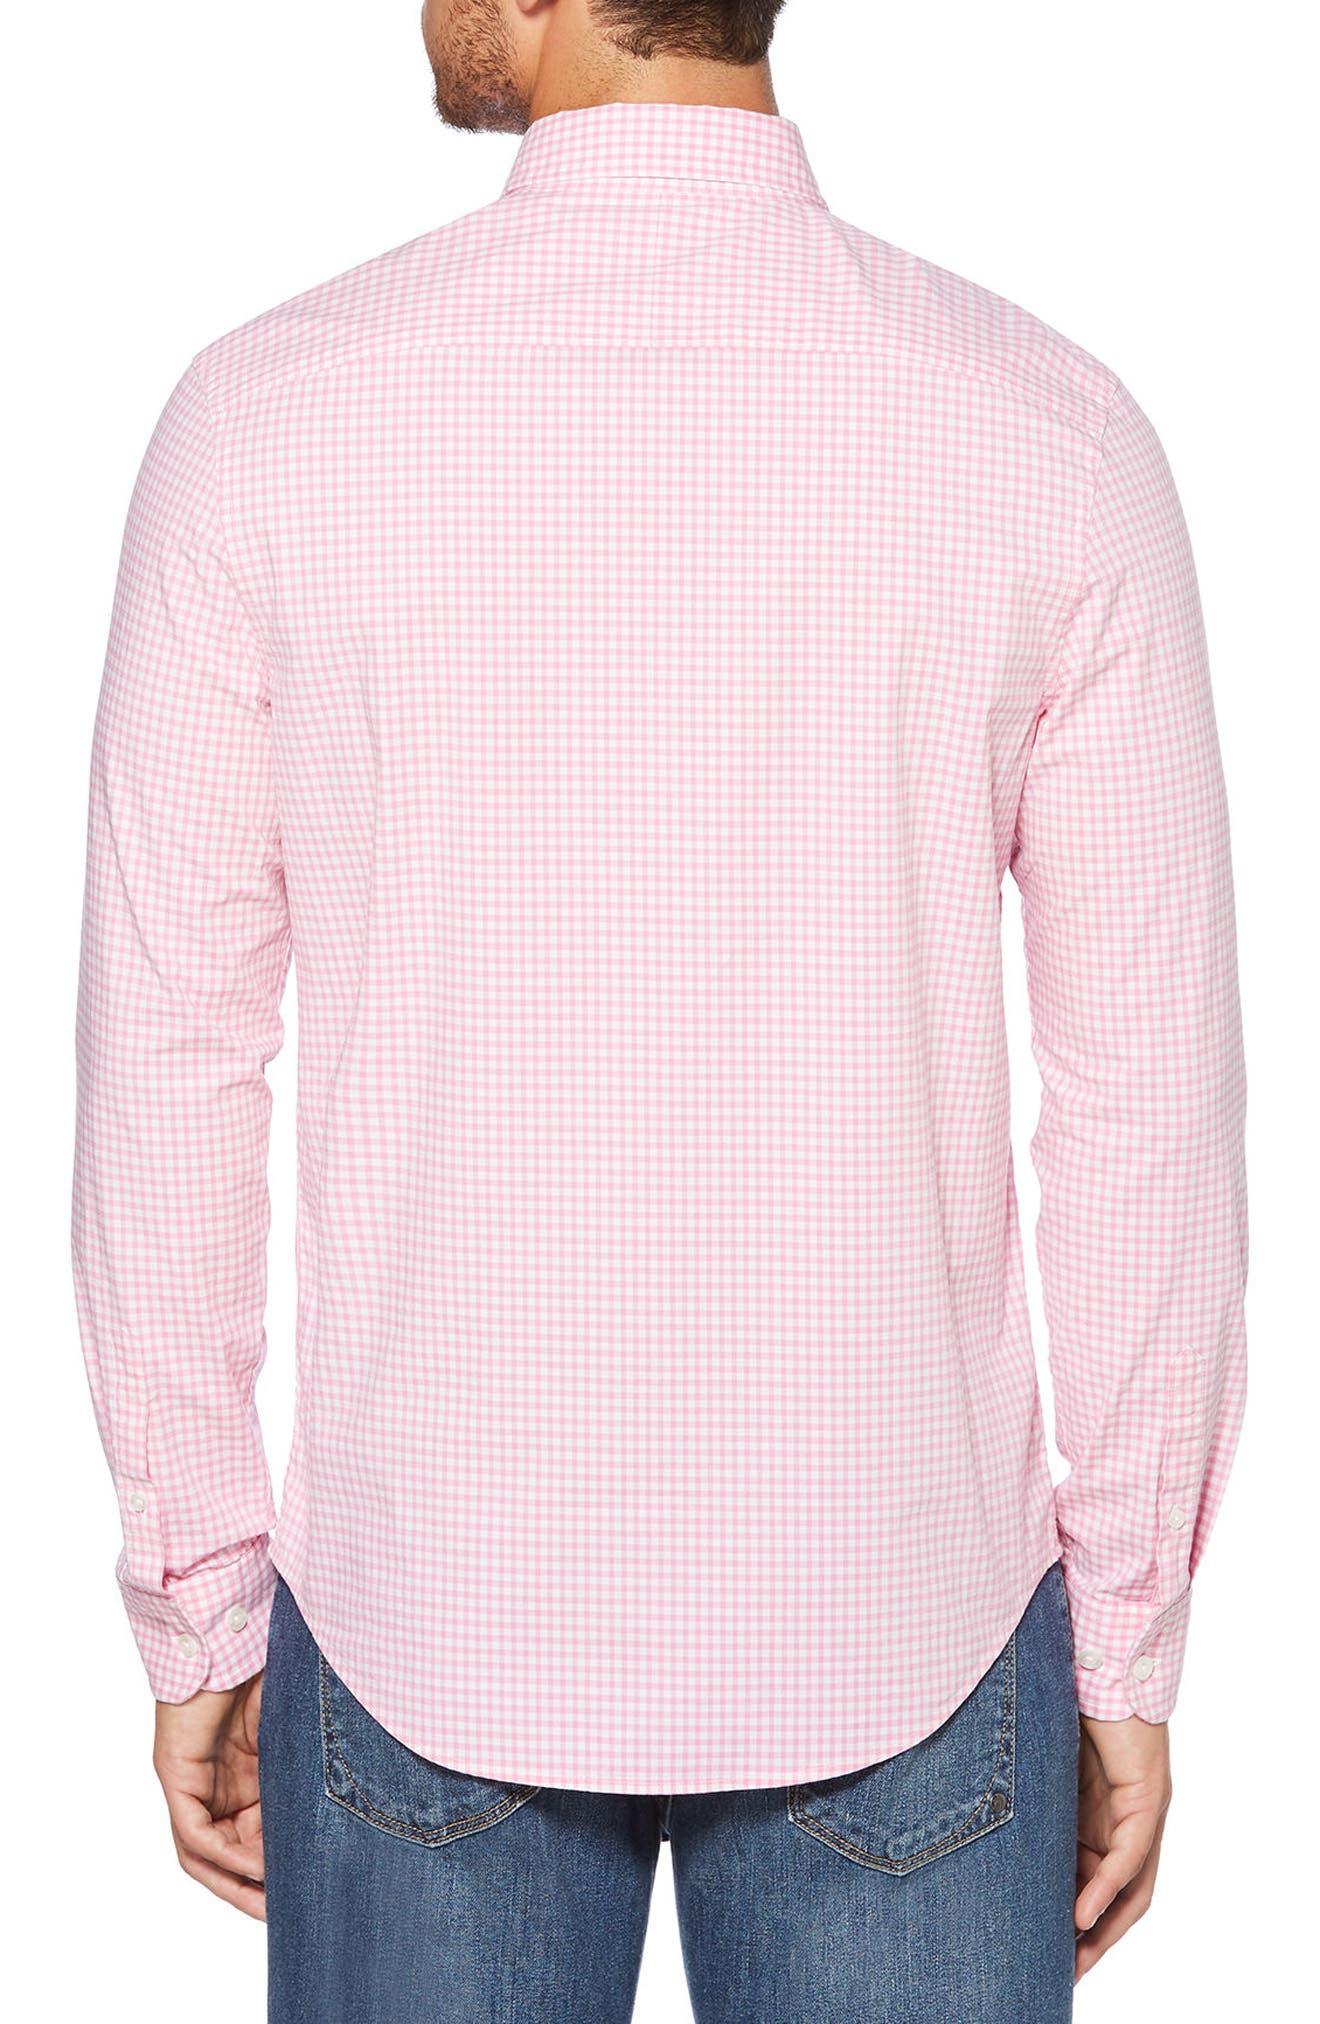 Gingham Shirt,                             Alternate thumbnail 2, color,                             Fuchsia Pink